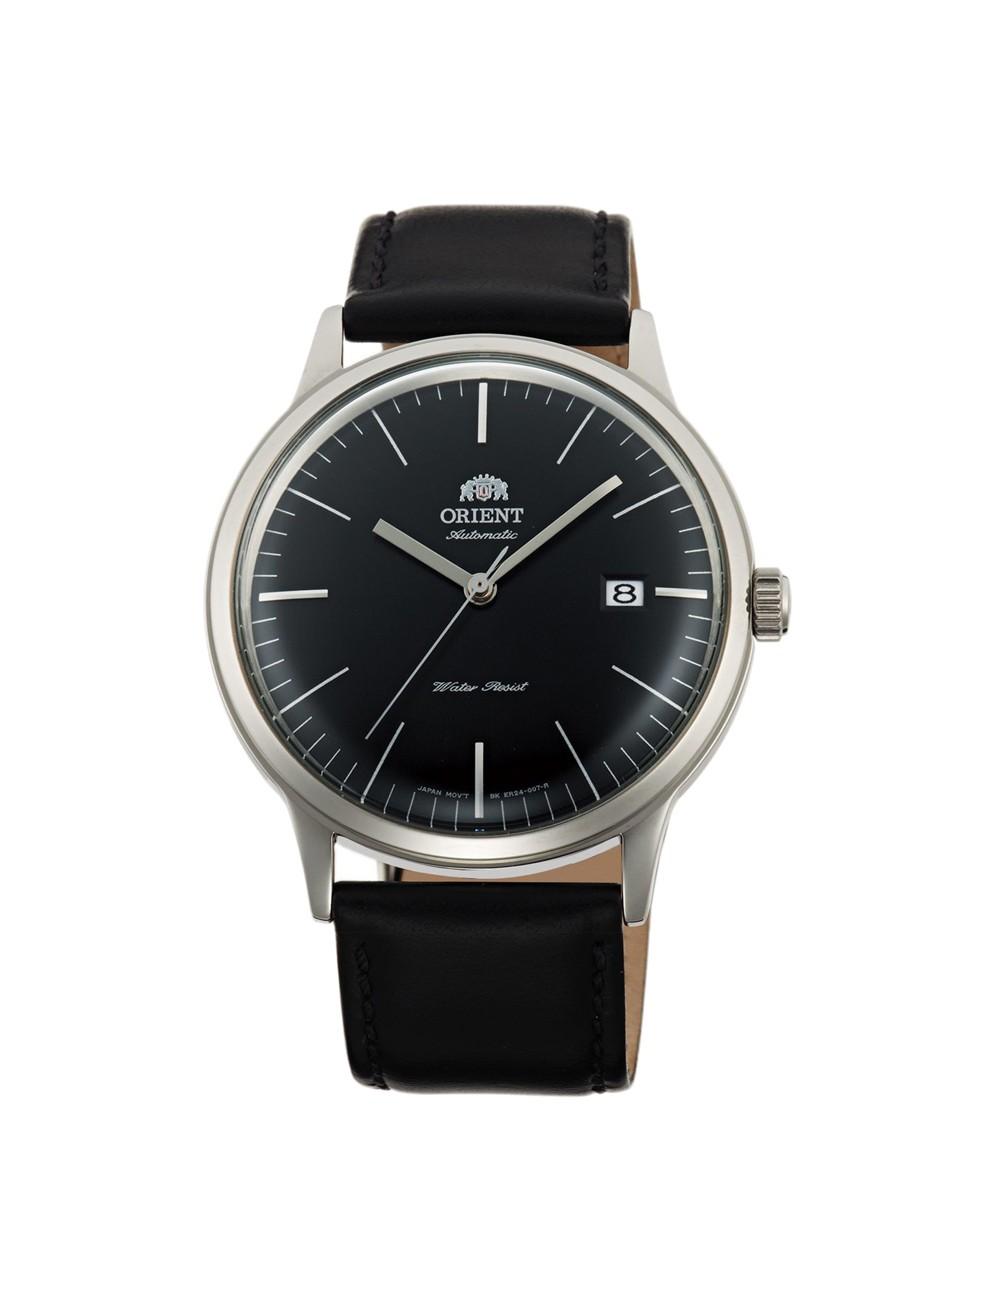 Orient Bambino Automatic FAC0000DD0 Mens Watch